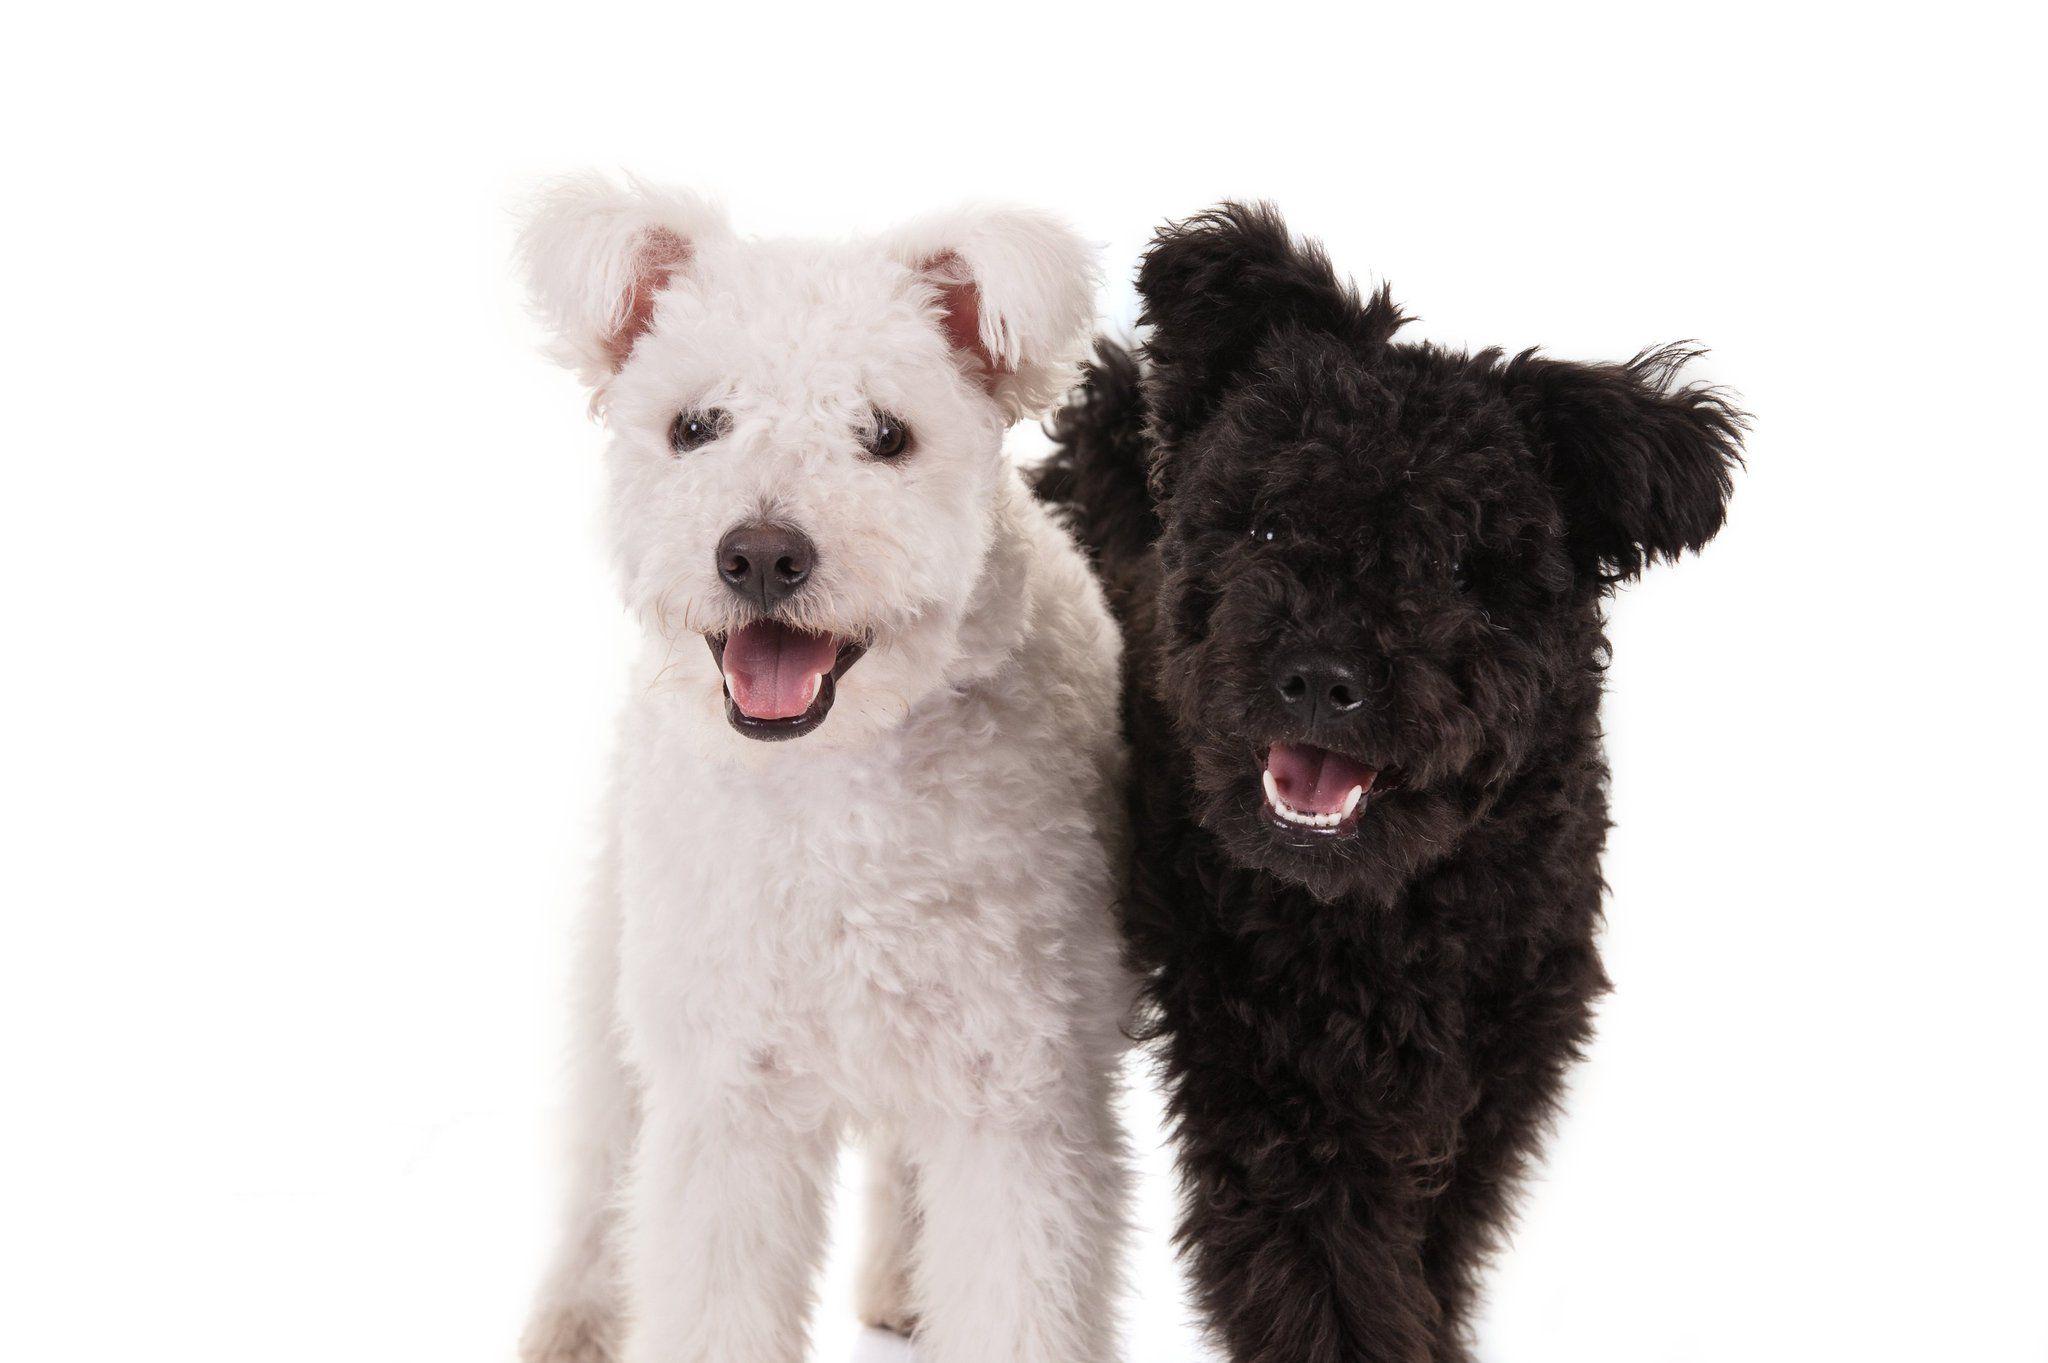 Pumi Dog Breed Information Pumi dog, Dog breeds, Dogs